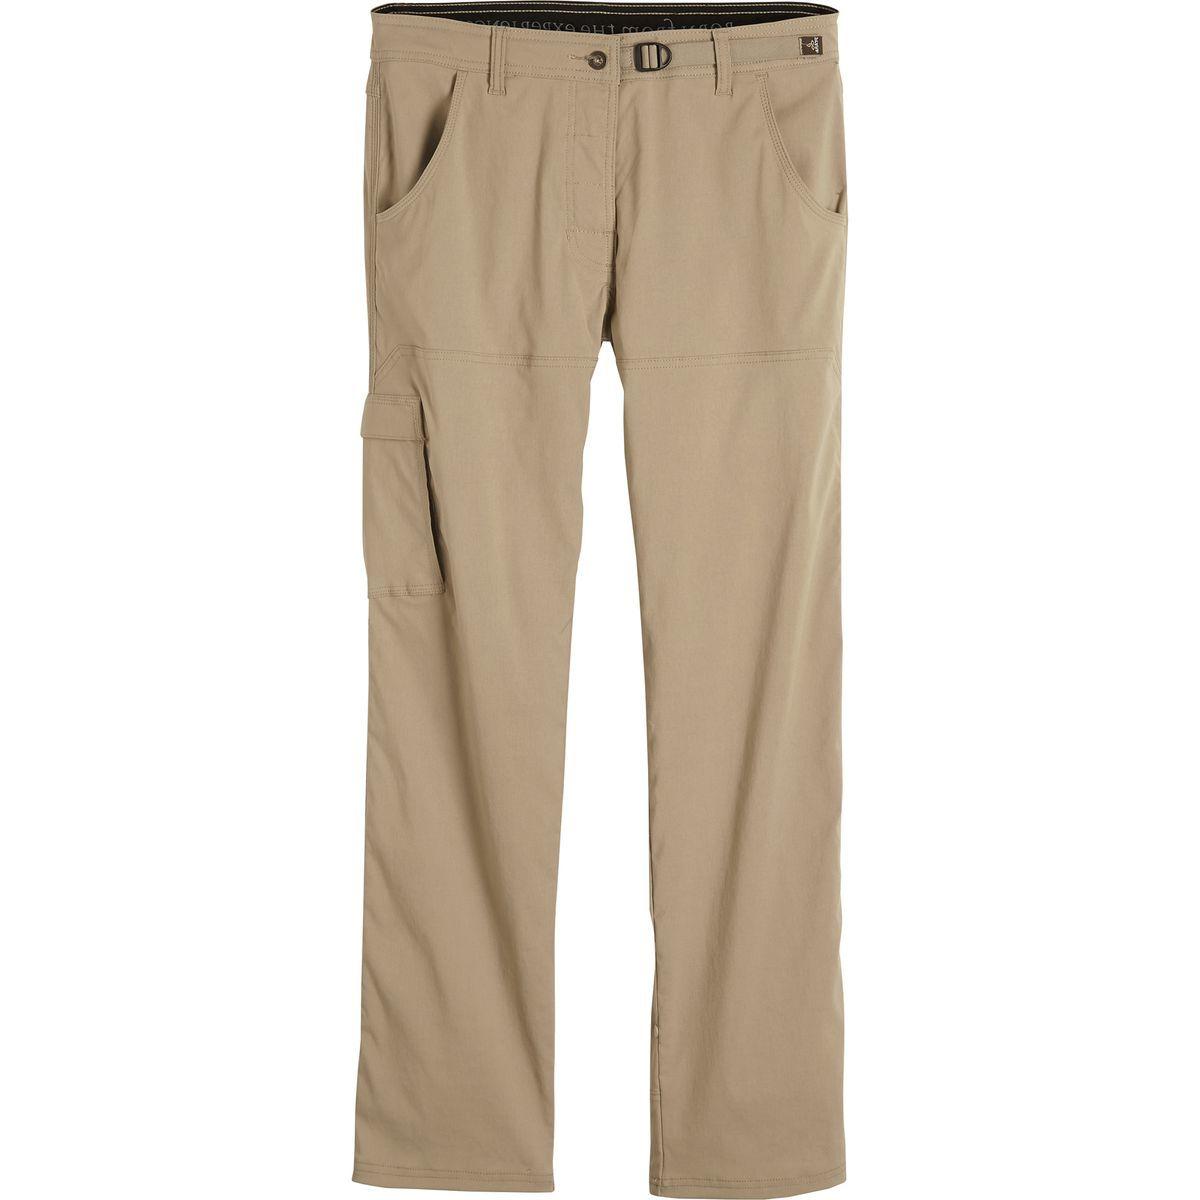 Prana Stretch Zion Pant - Men's